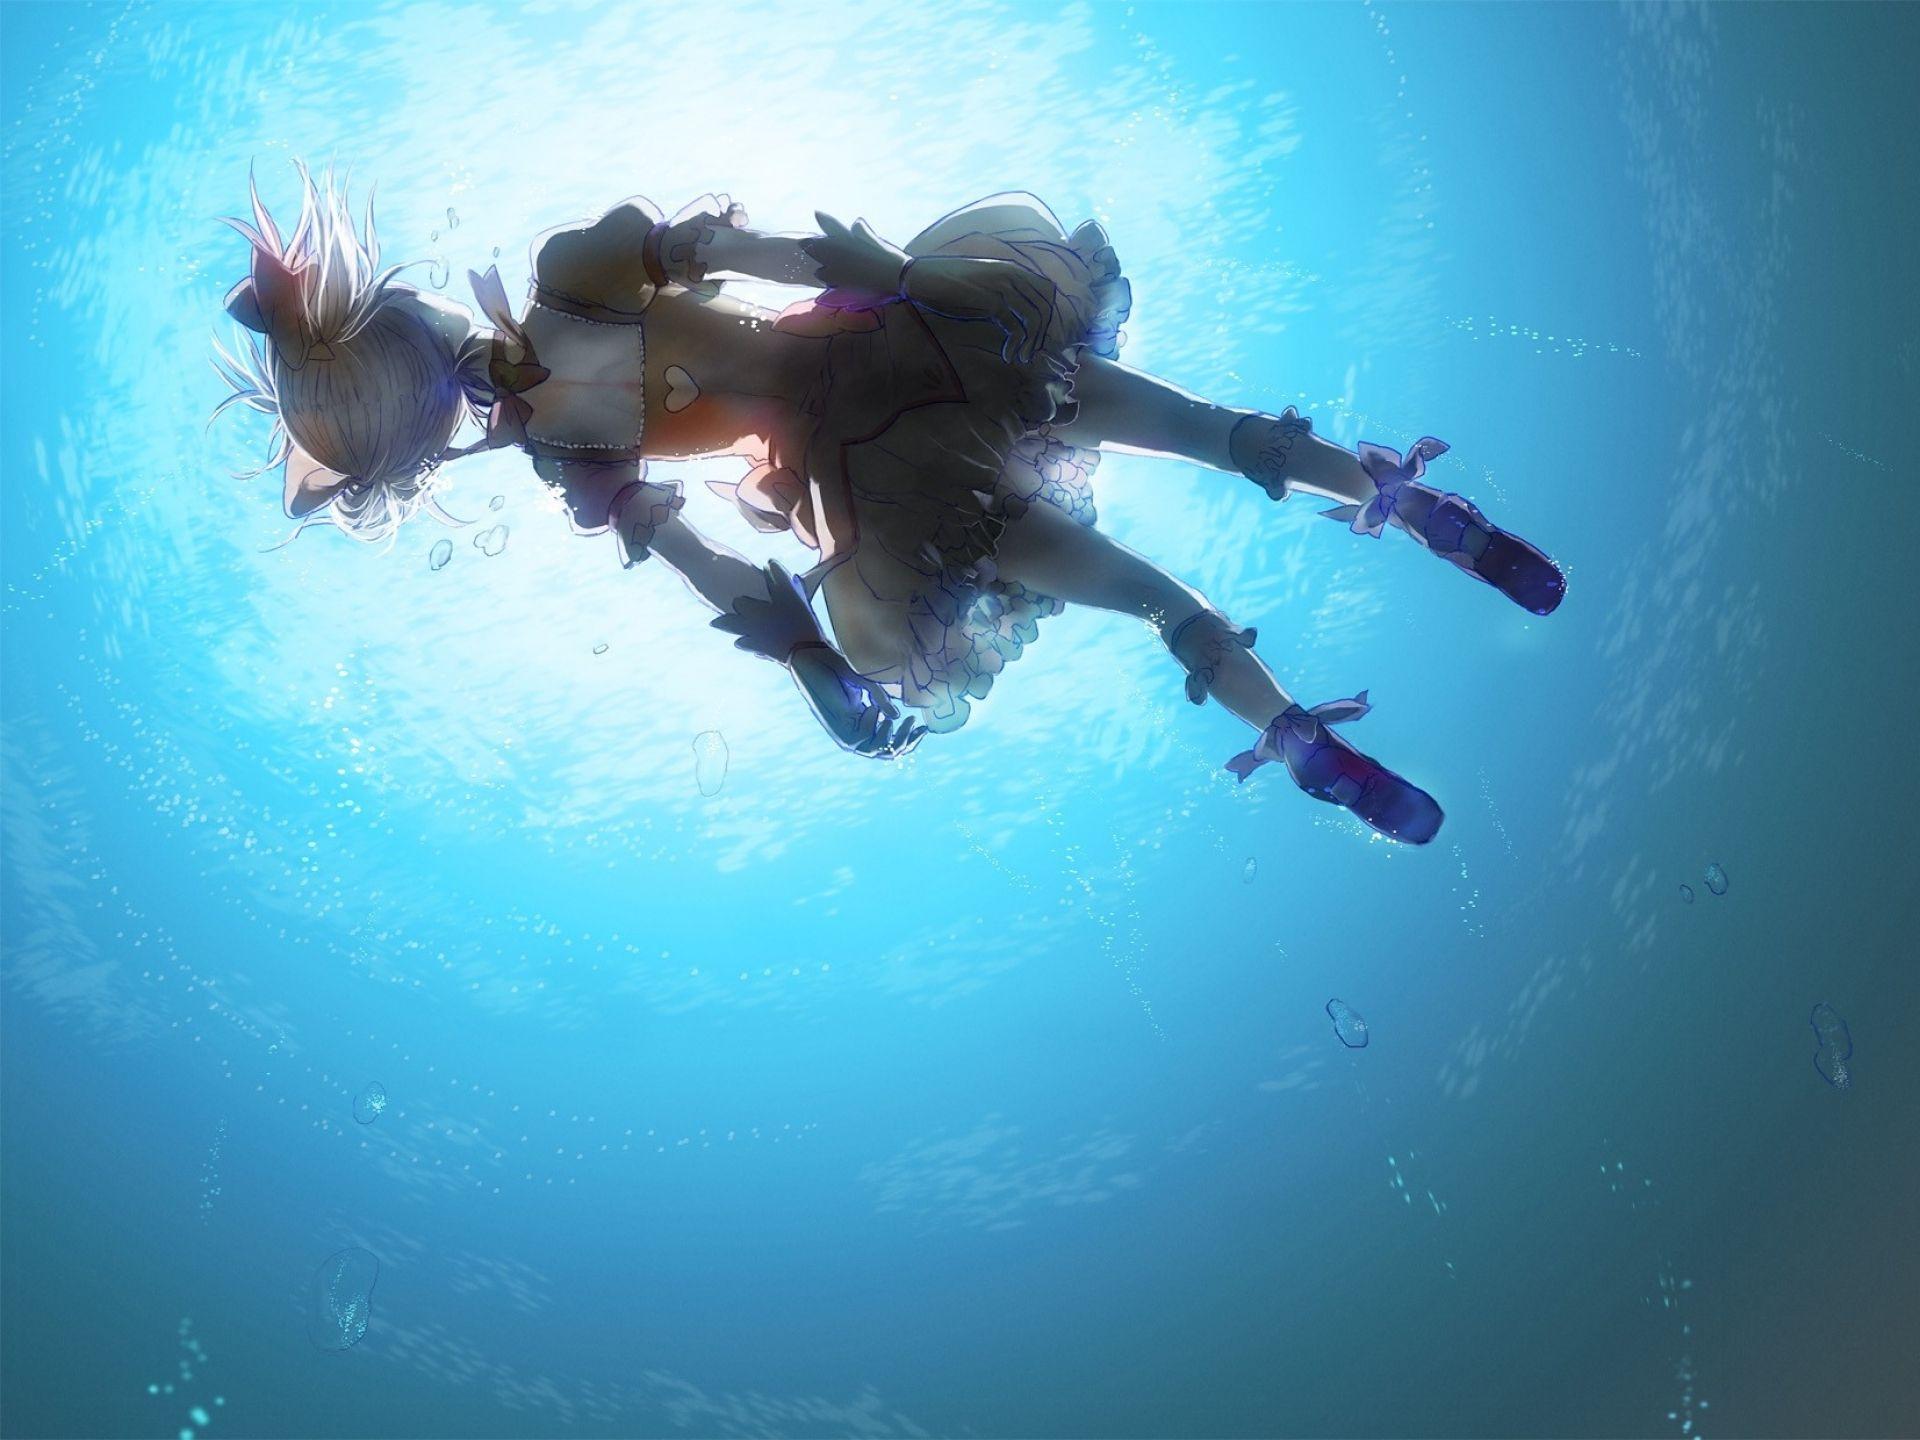 Anime Underwater Wallpapers - Top Free Anime Underwater